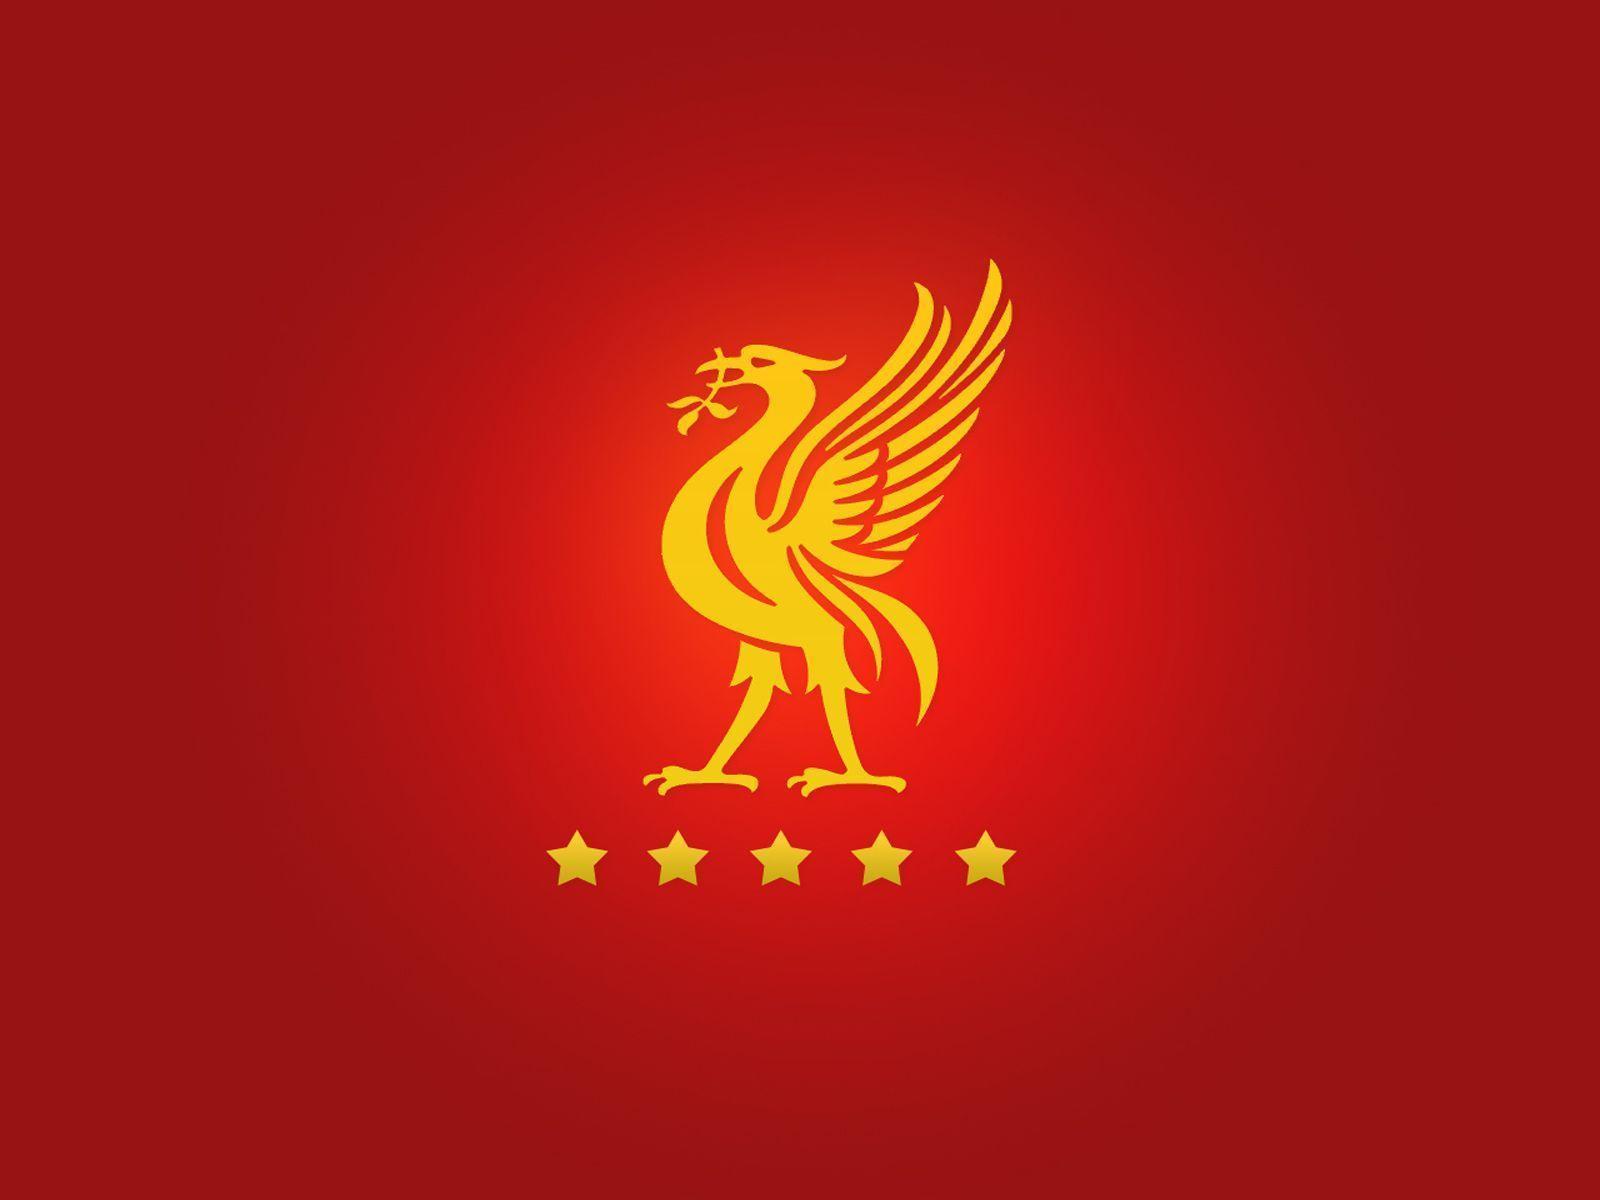 Wallpapers Logo Liverpool 2016 1600x1200